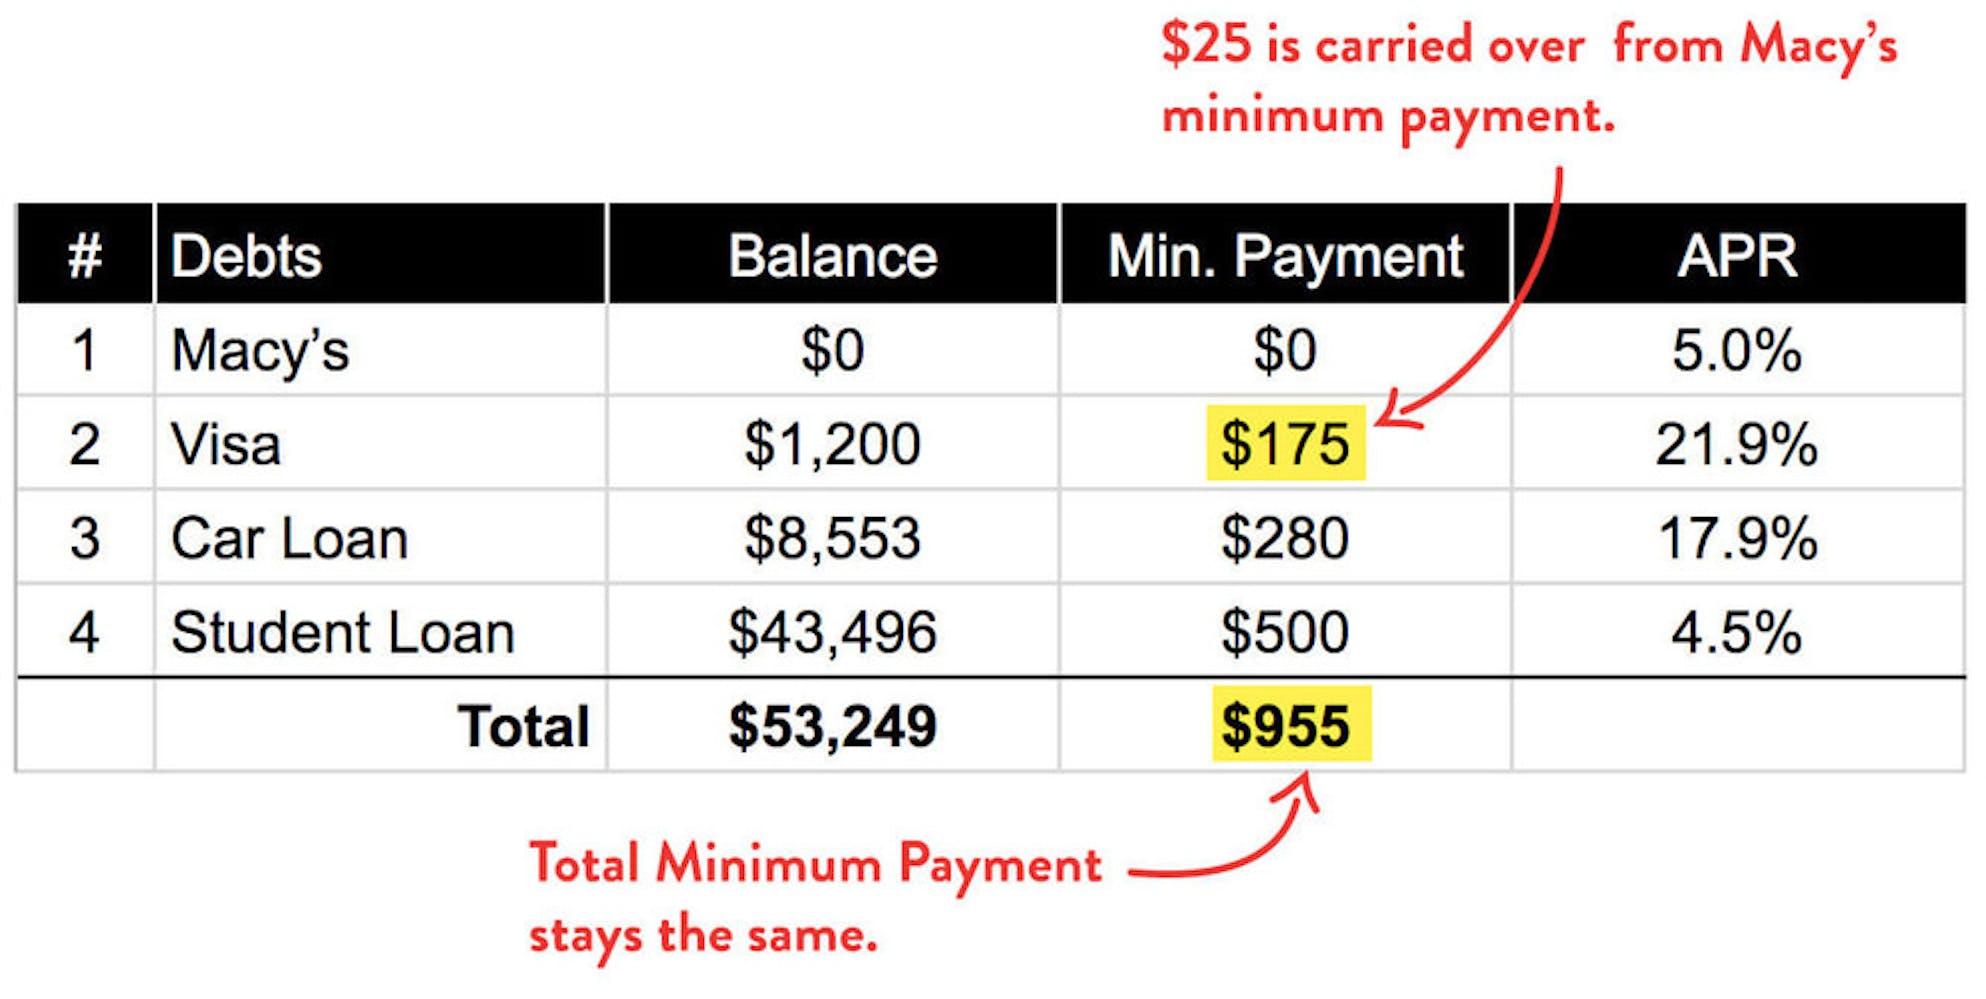 Debt Snowball Minimum Payments Carry Over